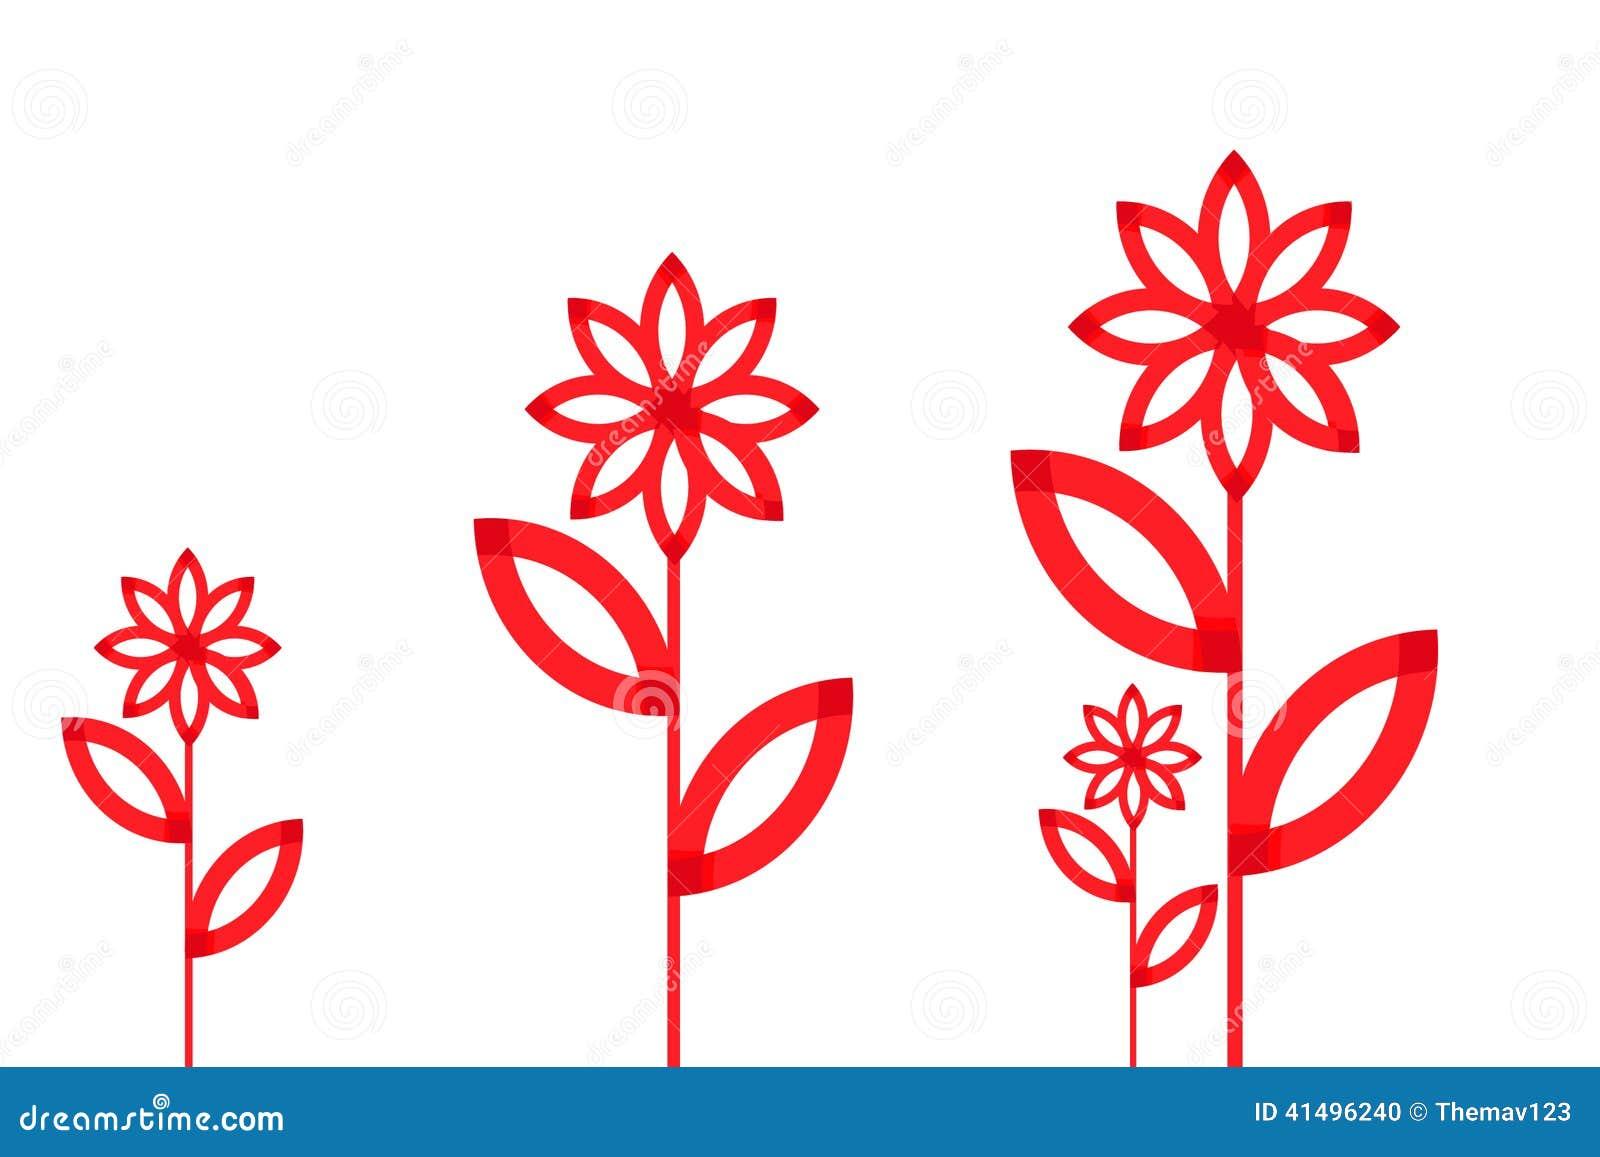 Flower symbol stock illustration illustration of white 41496240 flower symbol biocorpaavc Choice Image